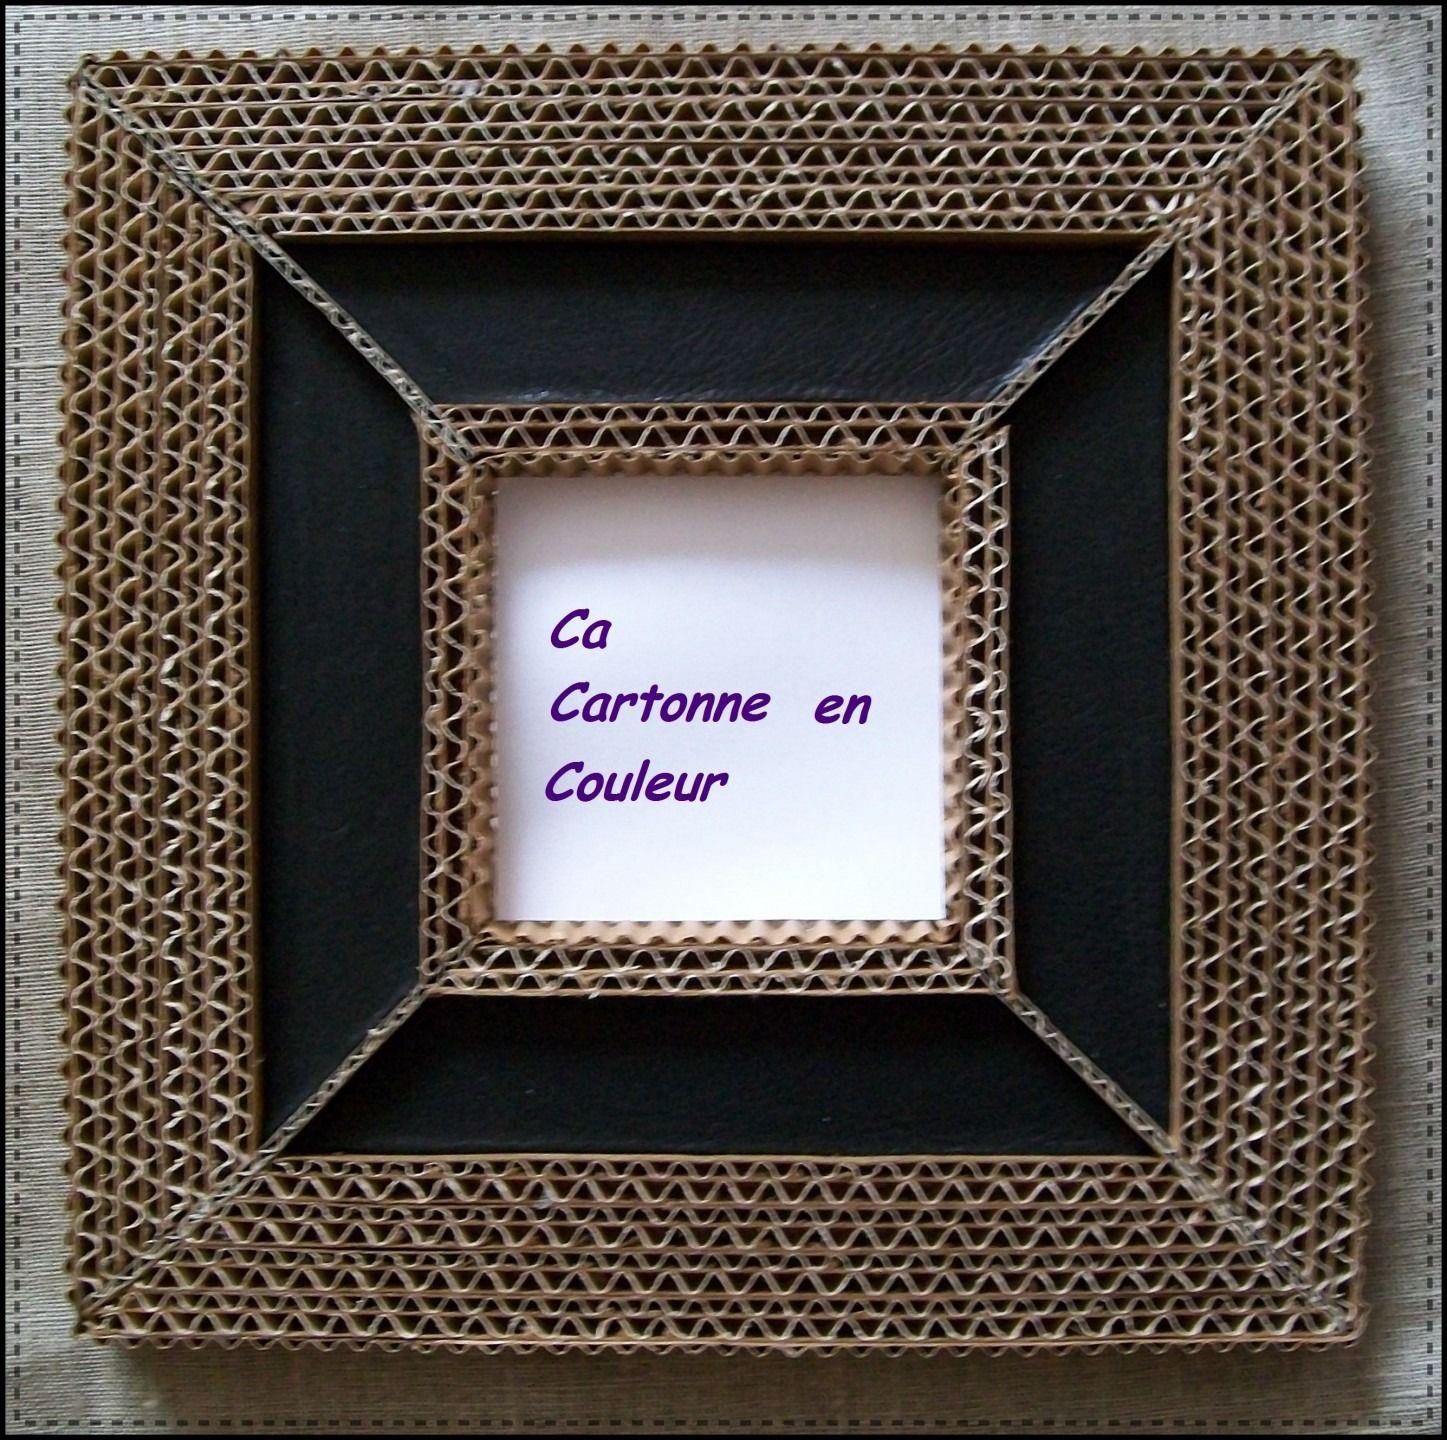 Cadre miroir en dentelle de carton et cuir noir cartonn for Miroir encadrement noir